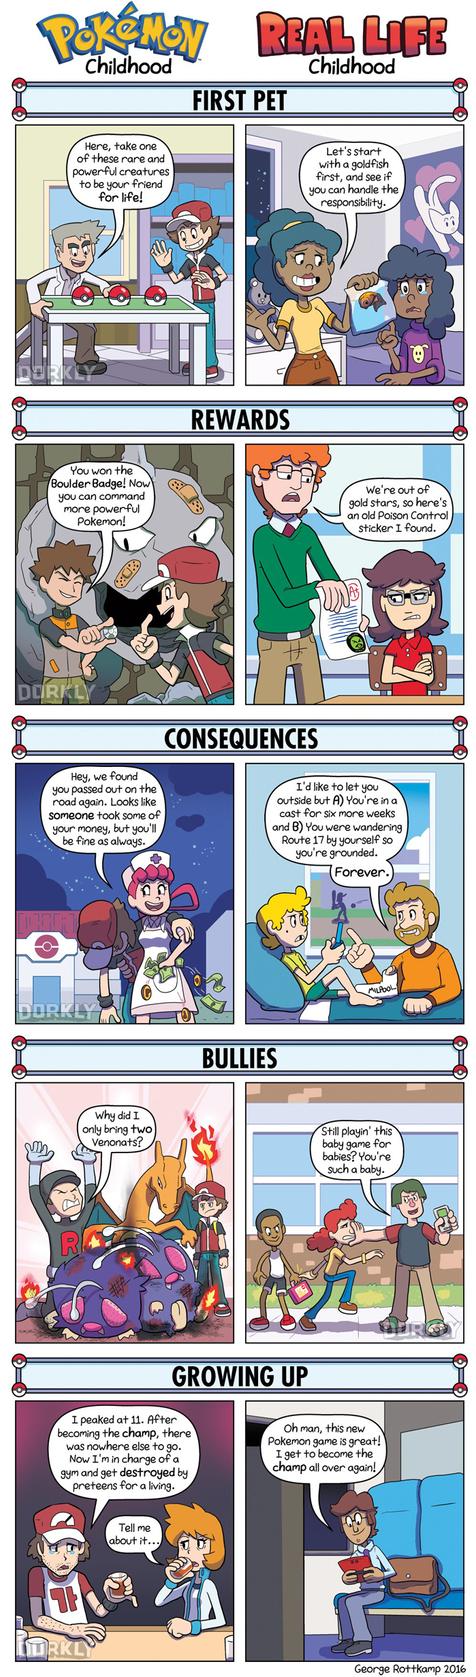 DORKLY: Pokemon Childhood Vs. Real-Life Childhood by GeorgeRottkamp